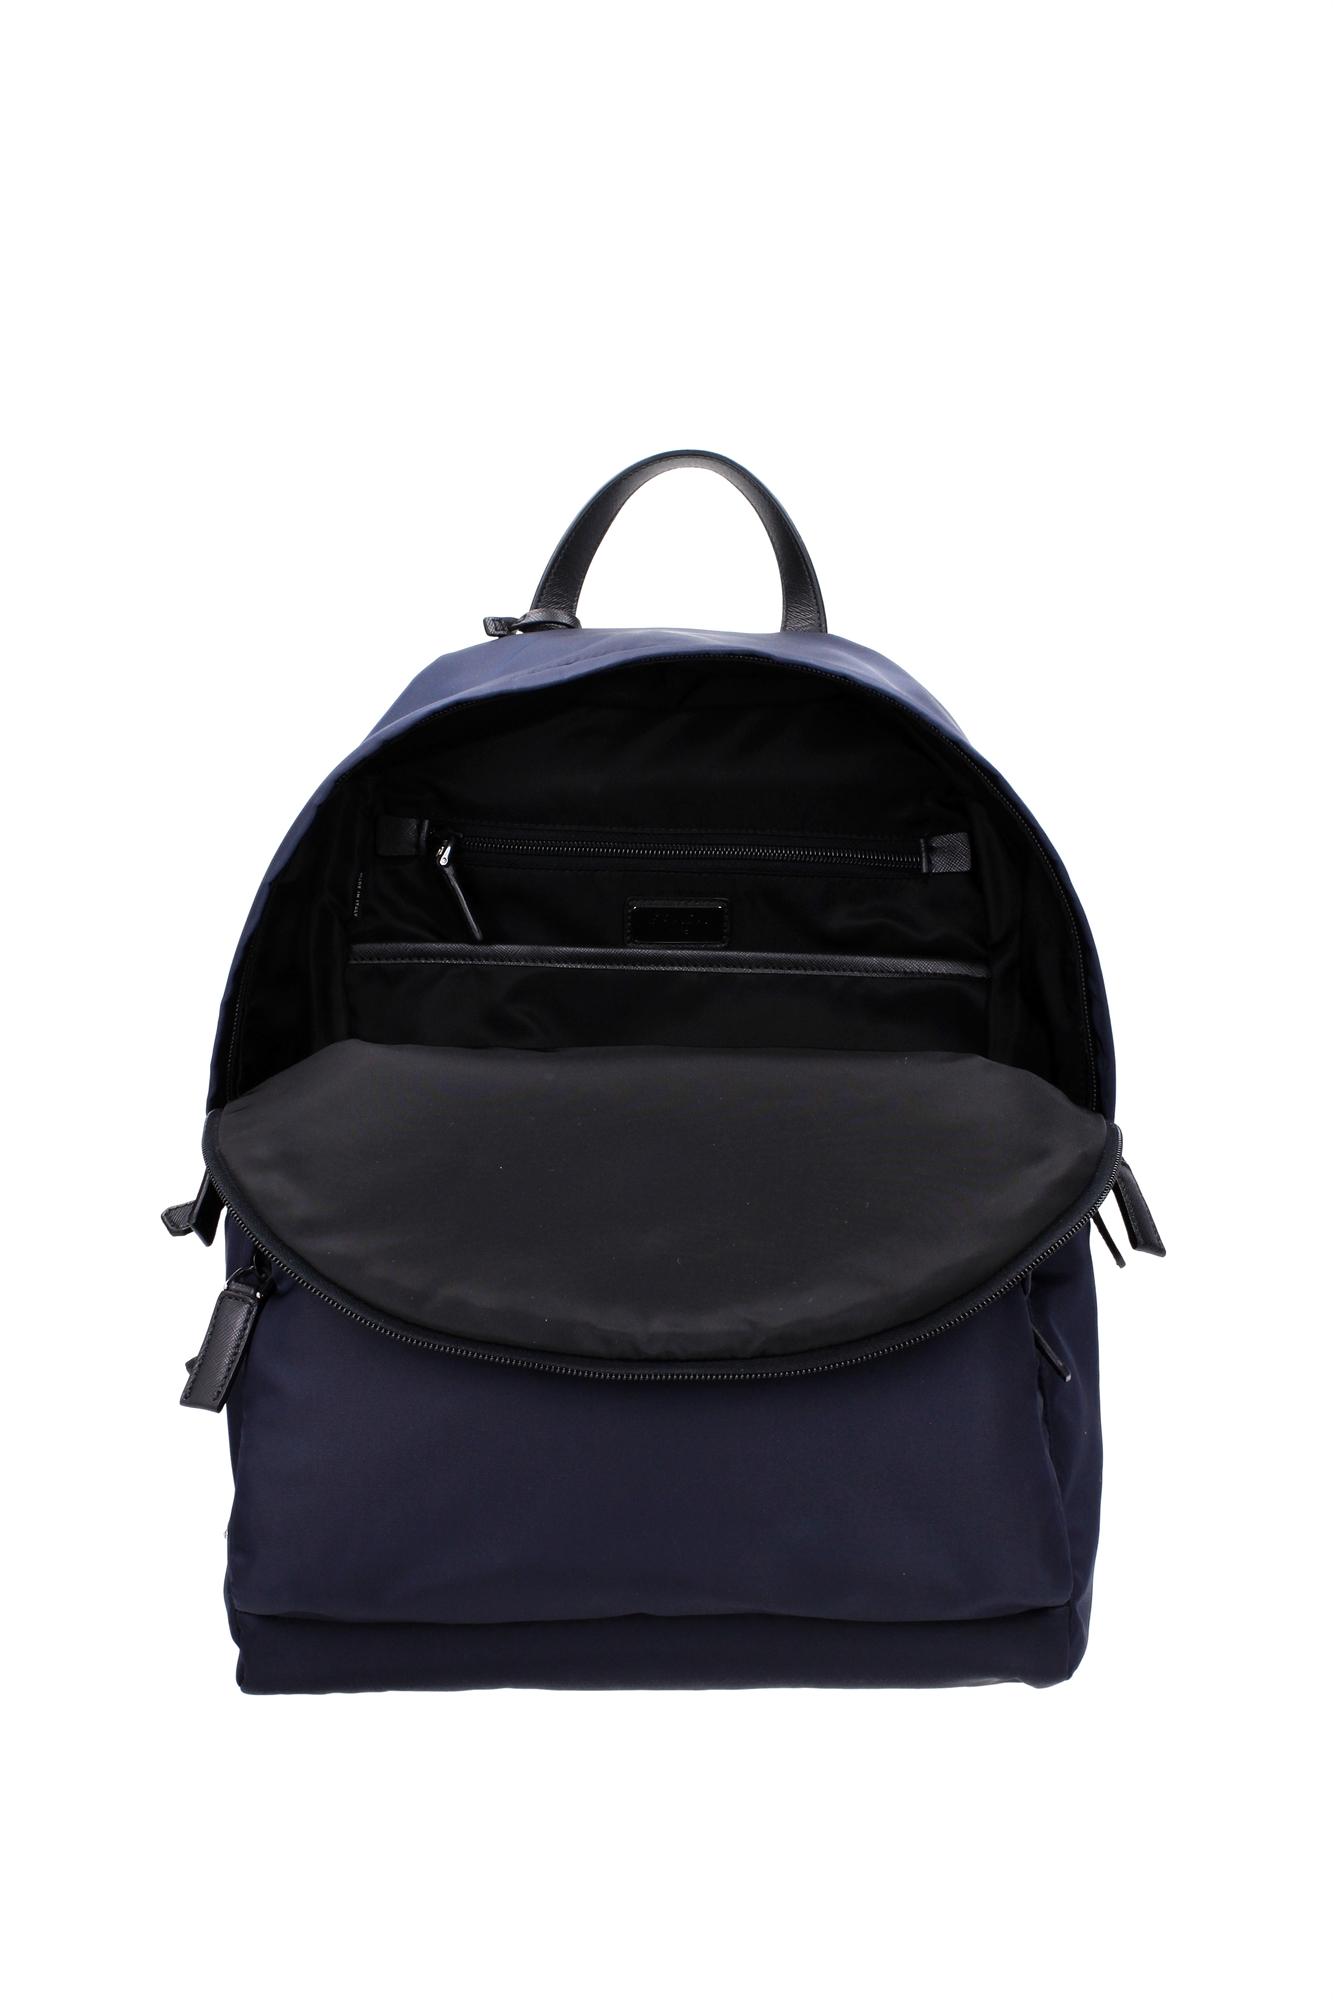 tasche rucksack prada herren stoff blau 2vz066bleu ebay. Black Bedroom Furniture Sets. Home Design Ideas